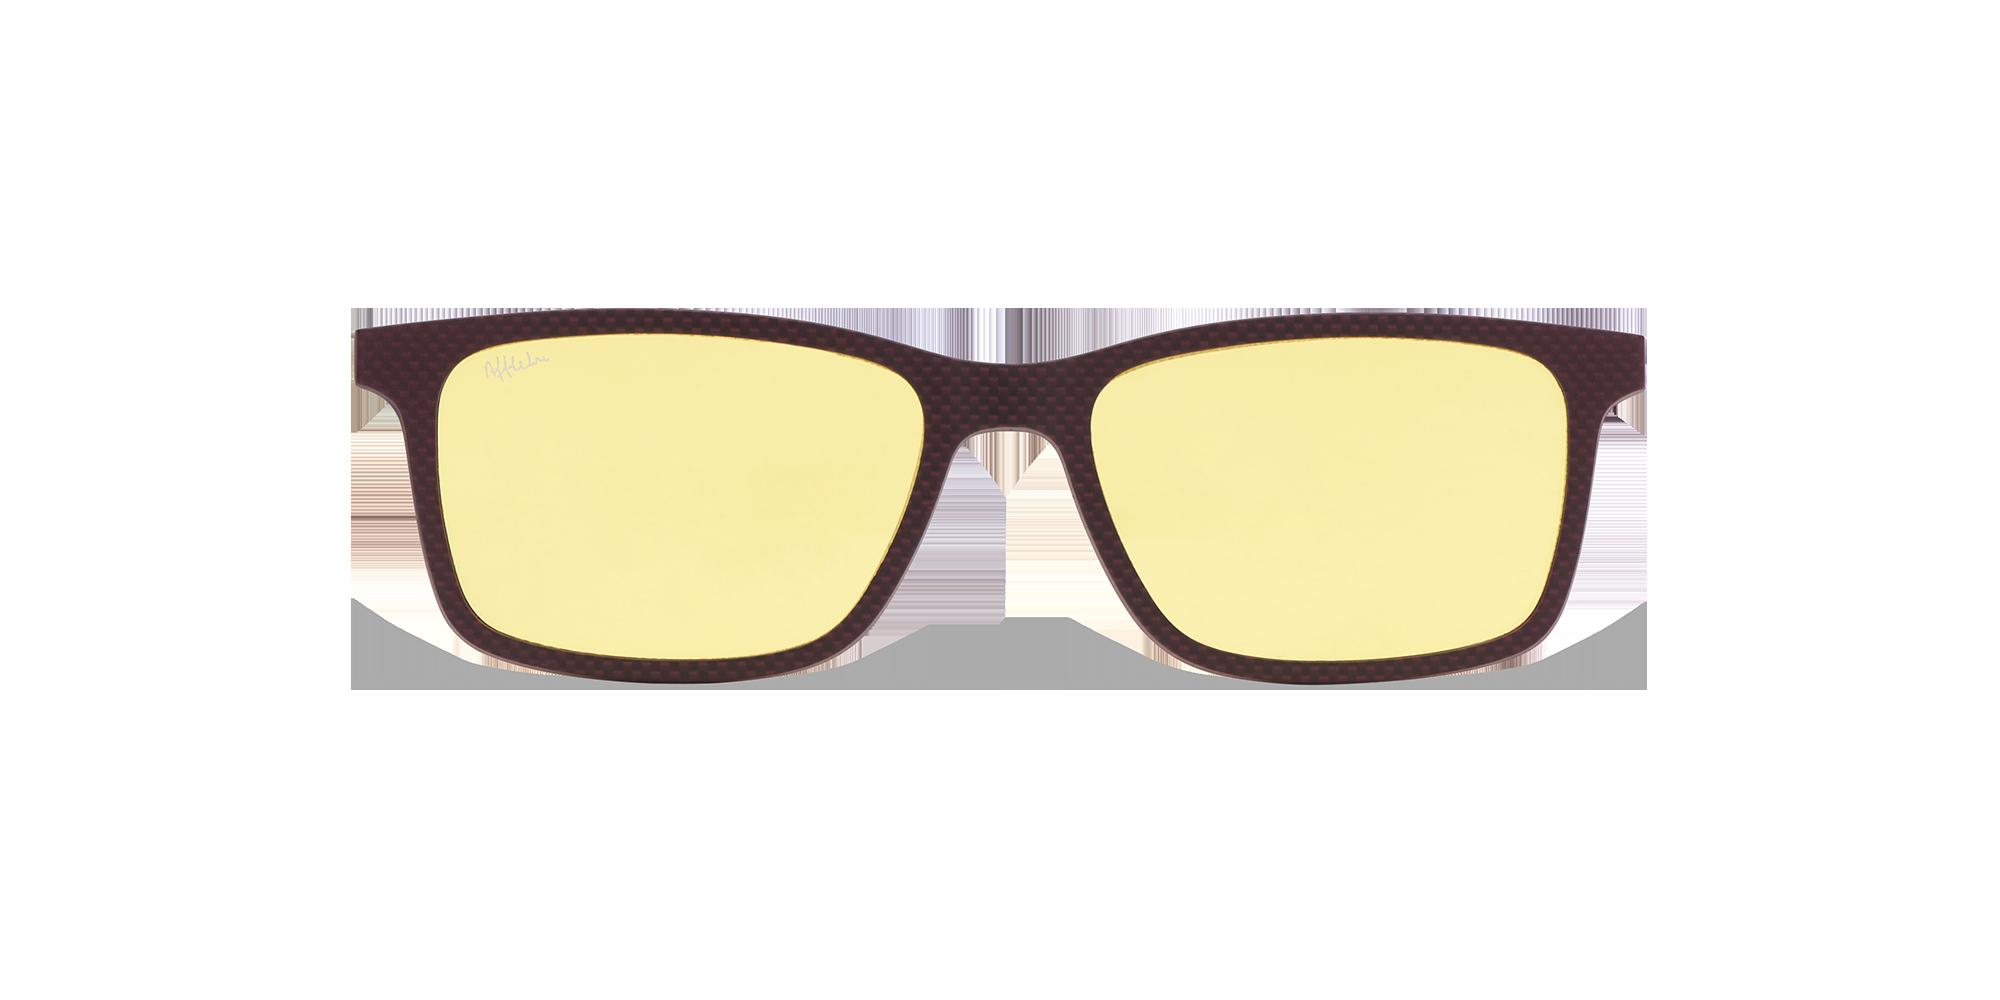 afflelou/france/products/smart_clip/clips_glasses/TMK32YERD015316.png